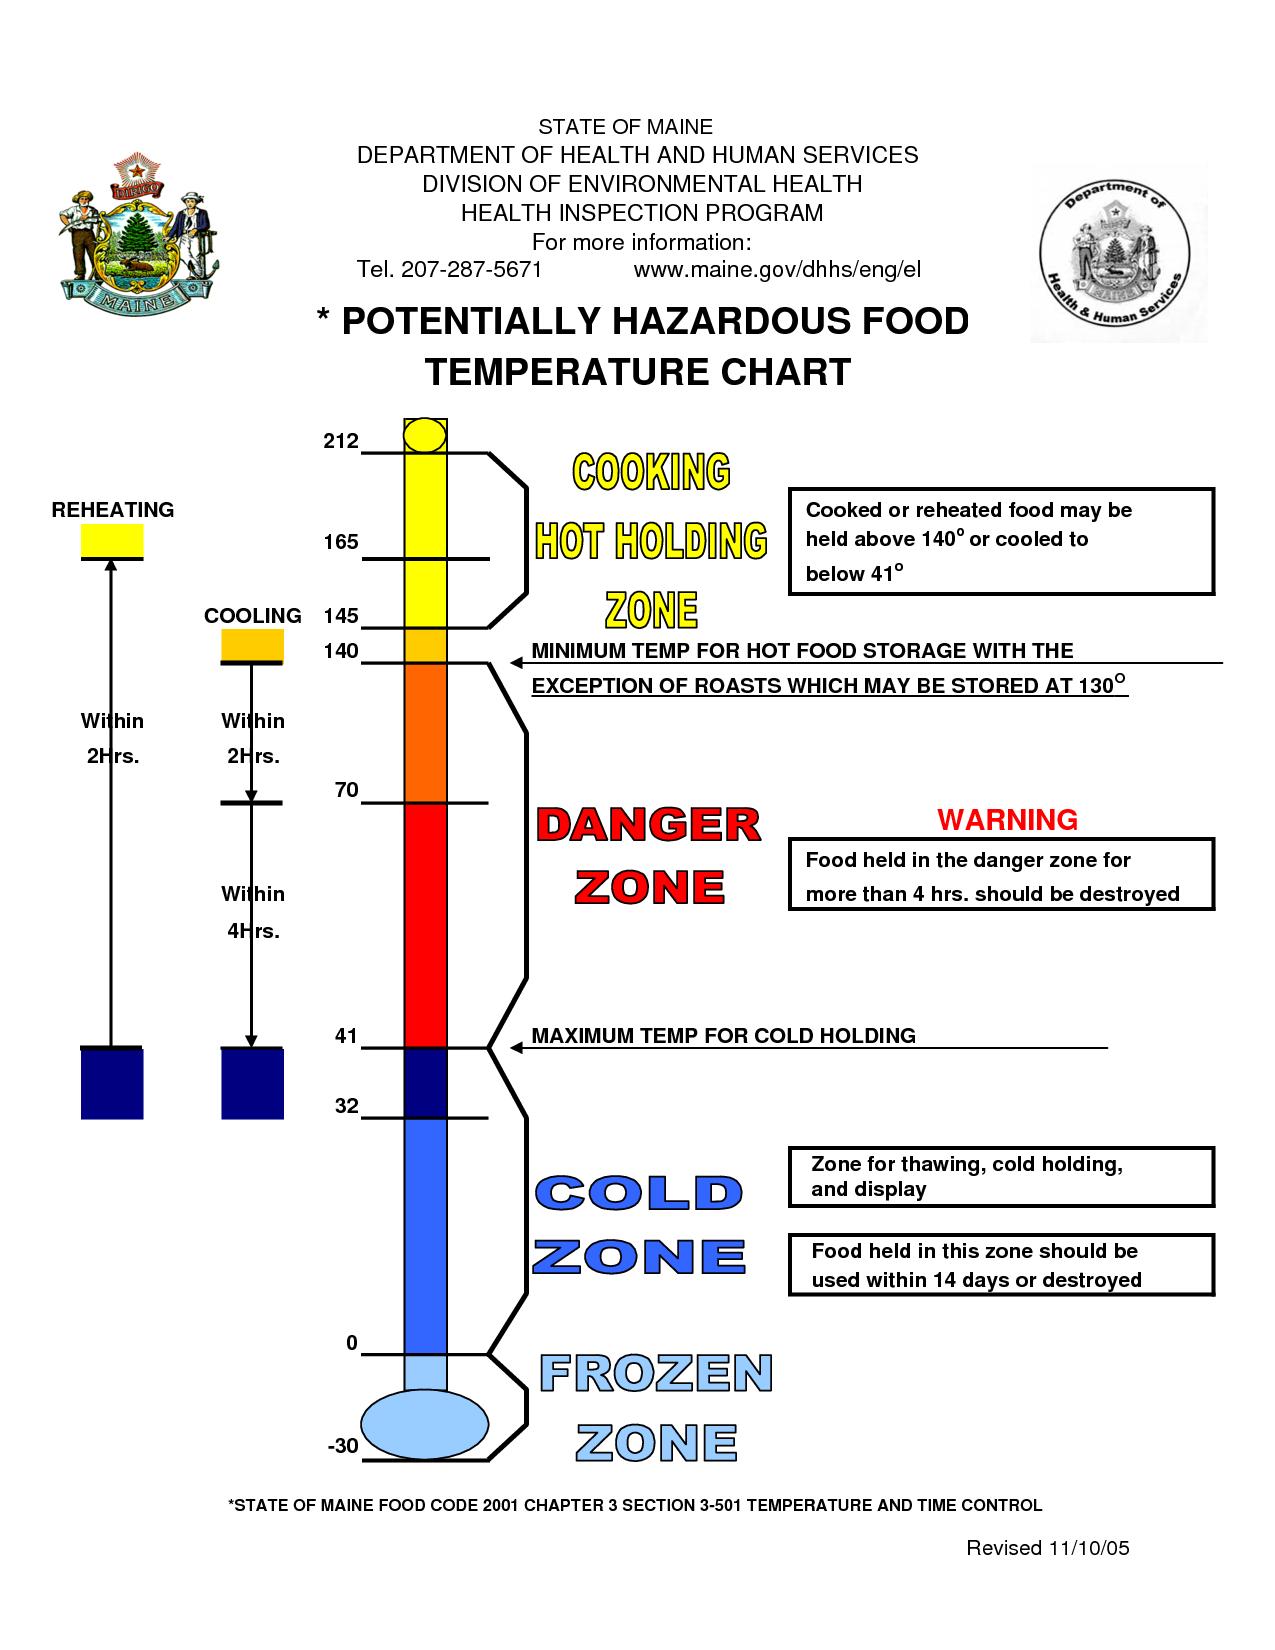 temperature chart template potentially hazardous food temperature humidity diagram food temperature diagram [ 1275 x 1650 Pixel ]